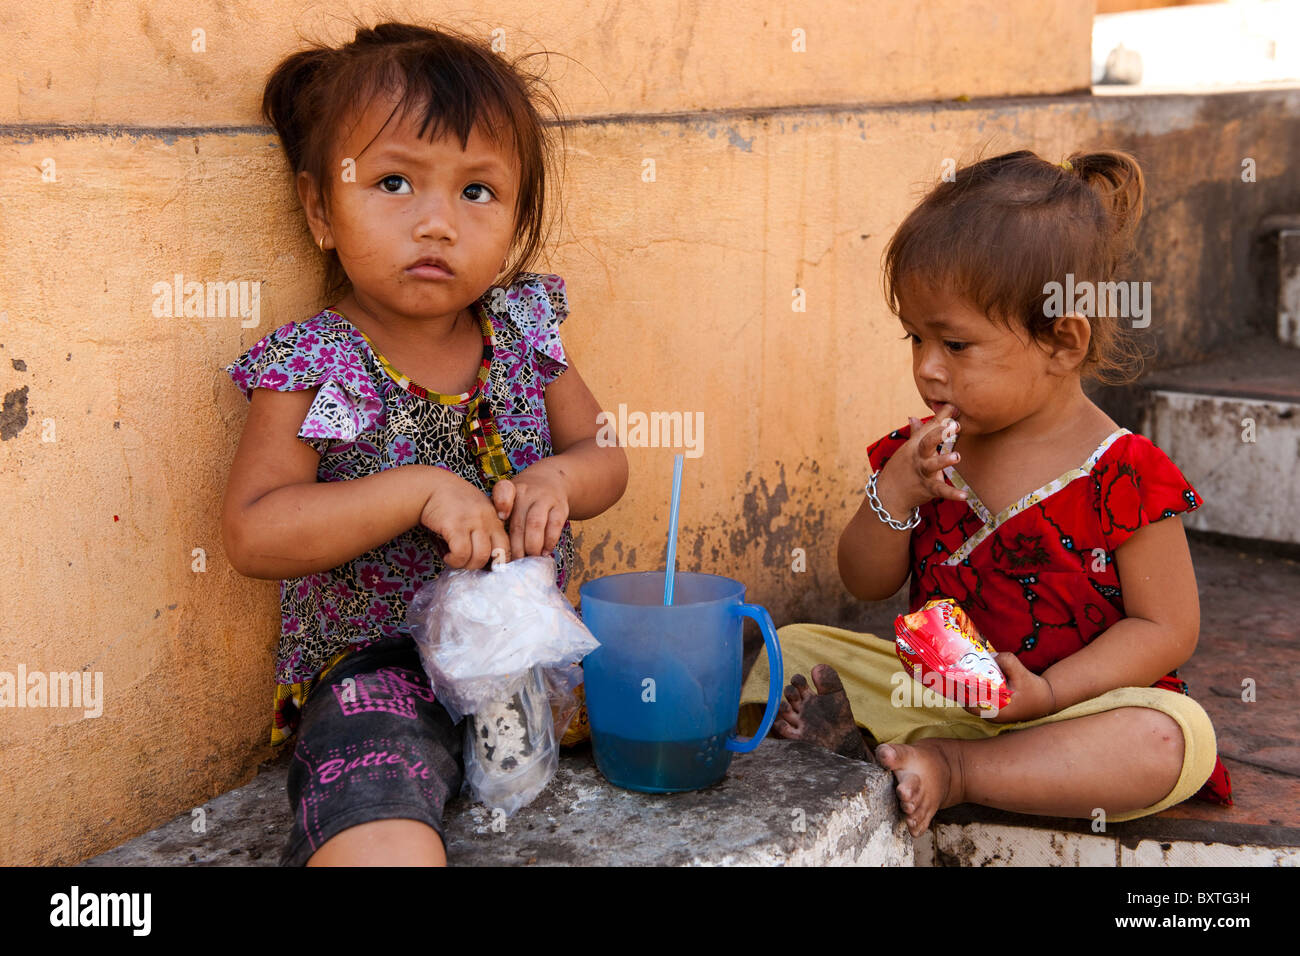 Girls, Mekong Delta, Chau Doc, Vietnam - Stock Image